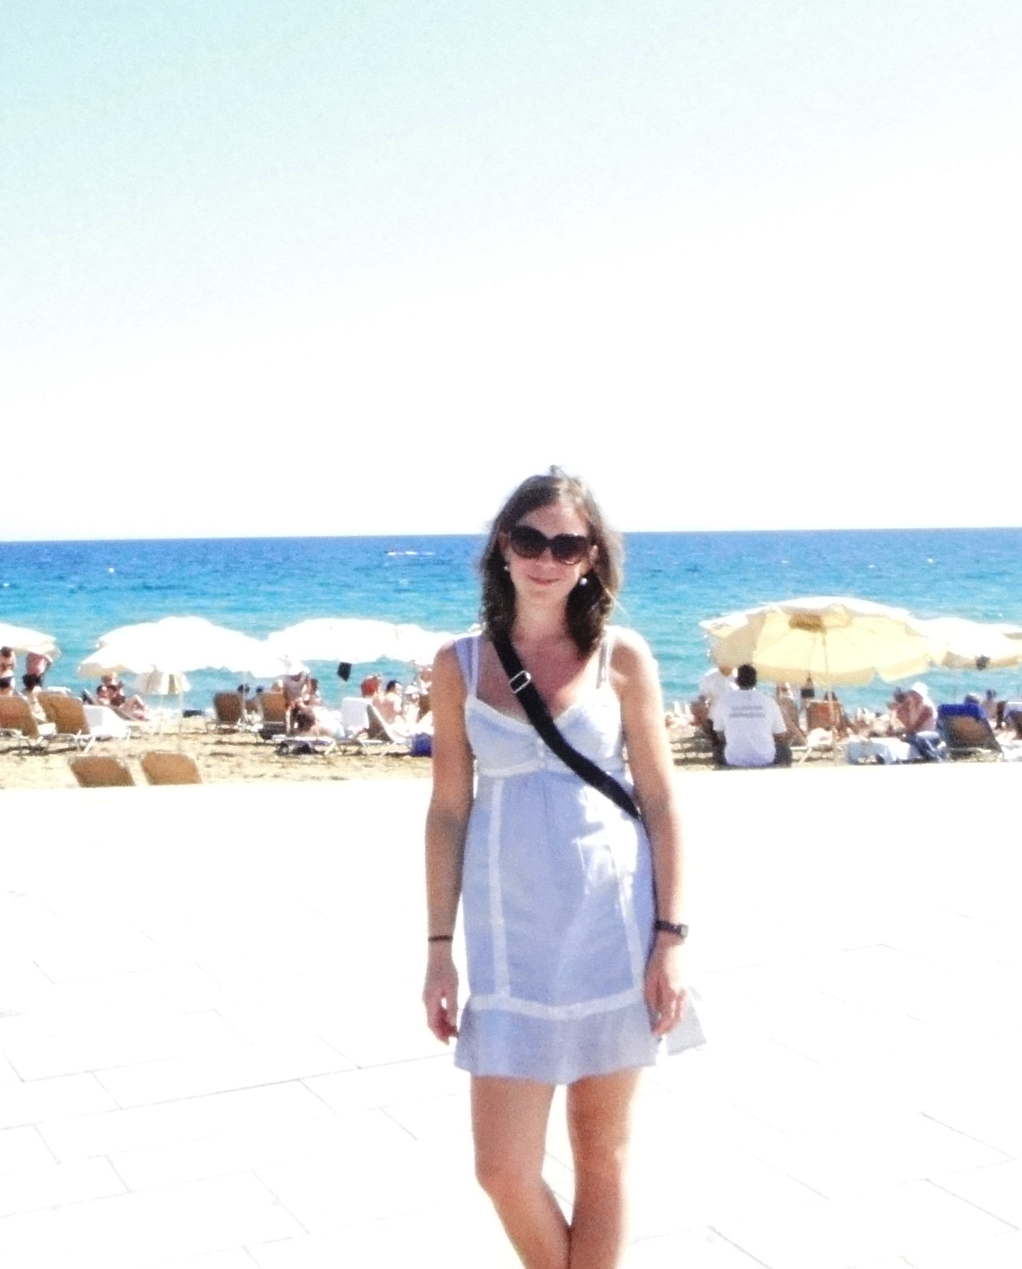 Barcelona_2011.jpg